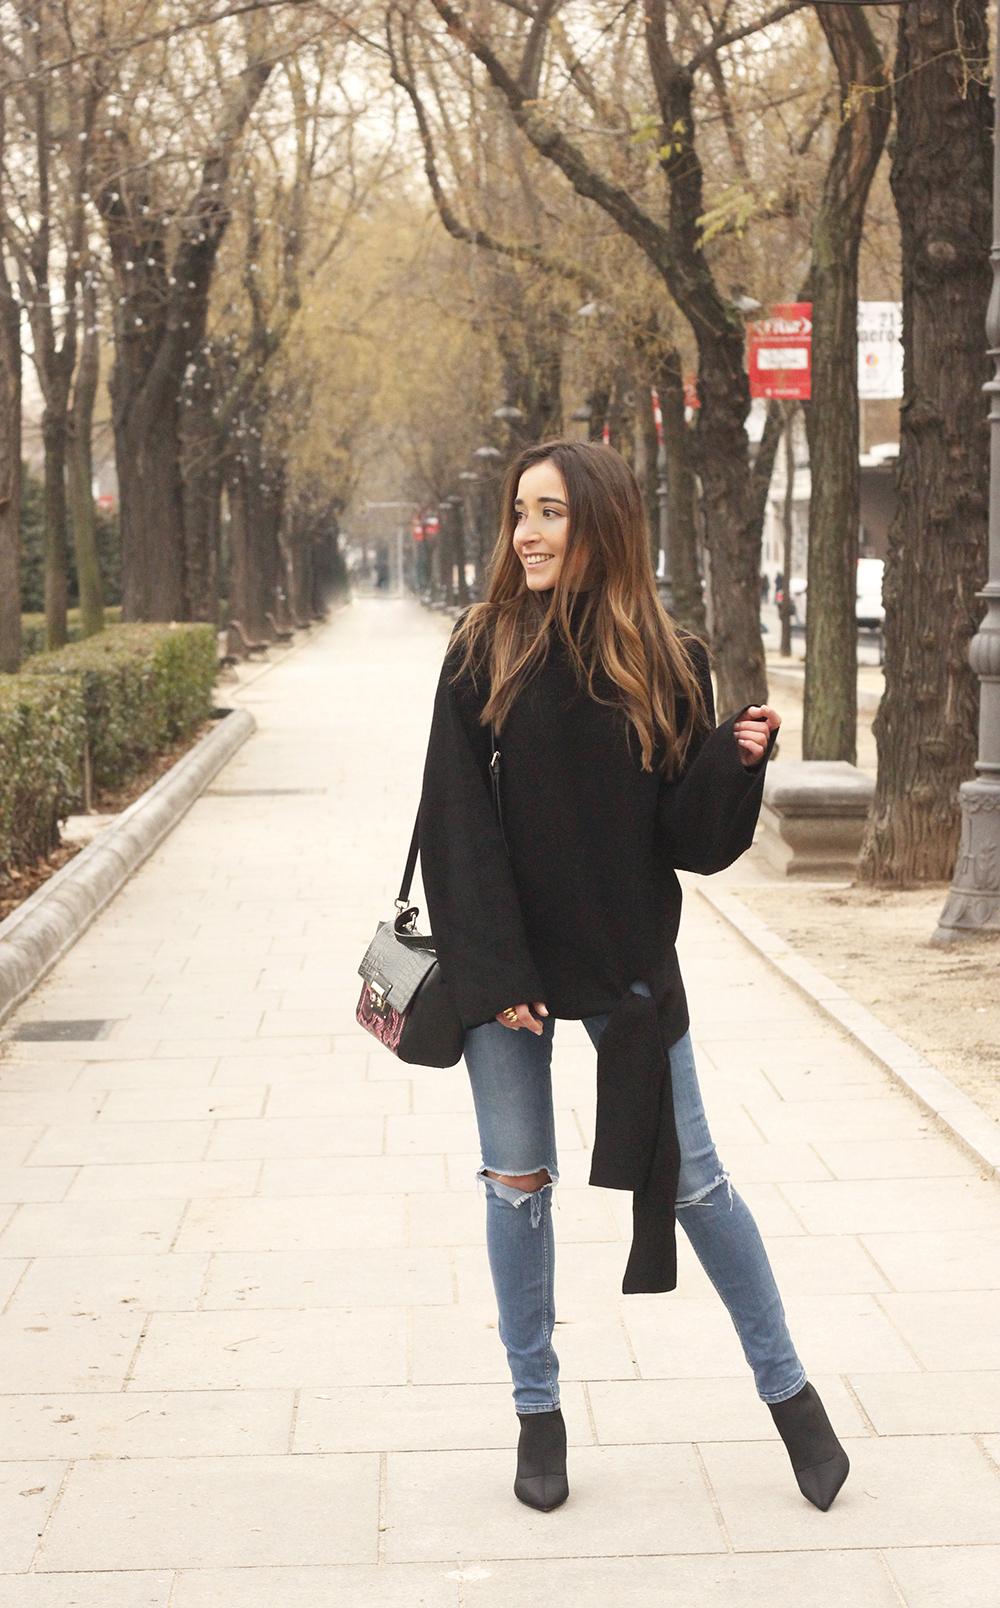 Black turtleneck sweater Uterqüe black ankle boots winter oufit 201806